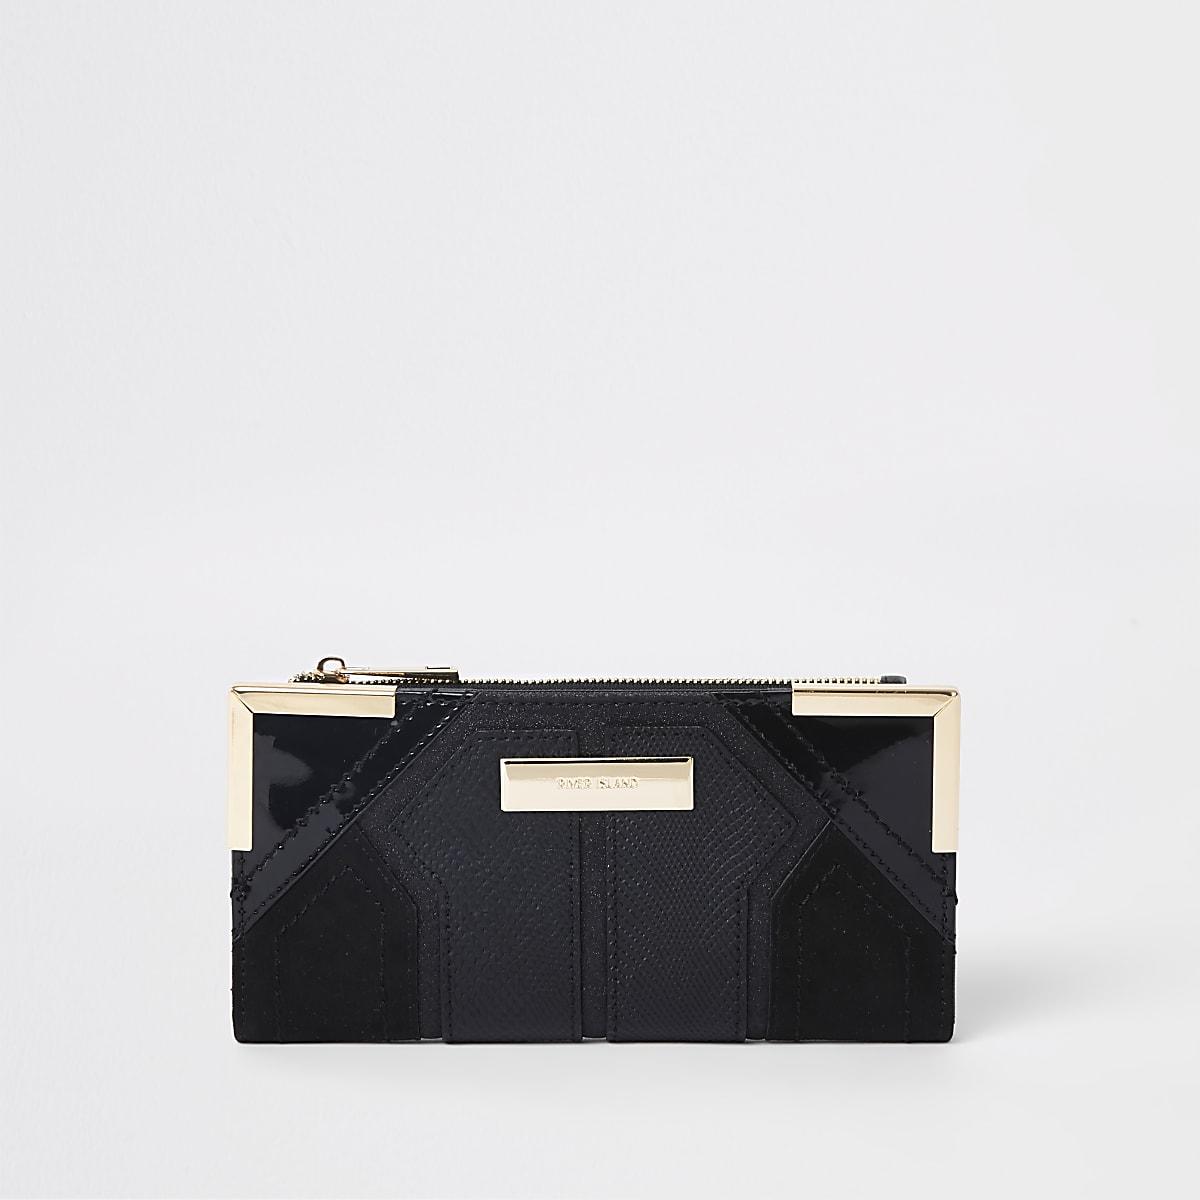 Black metal corner textured foldout purse